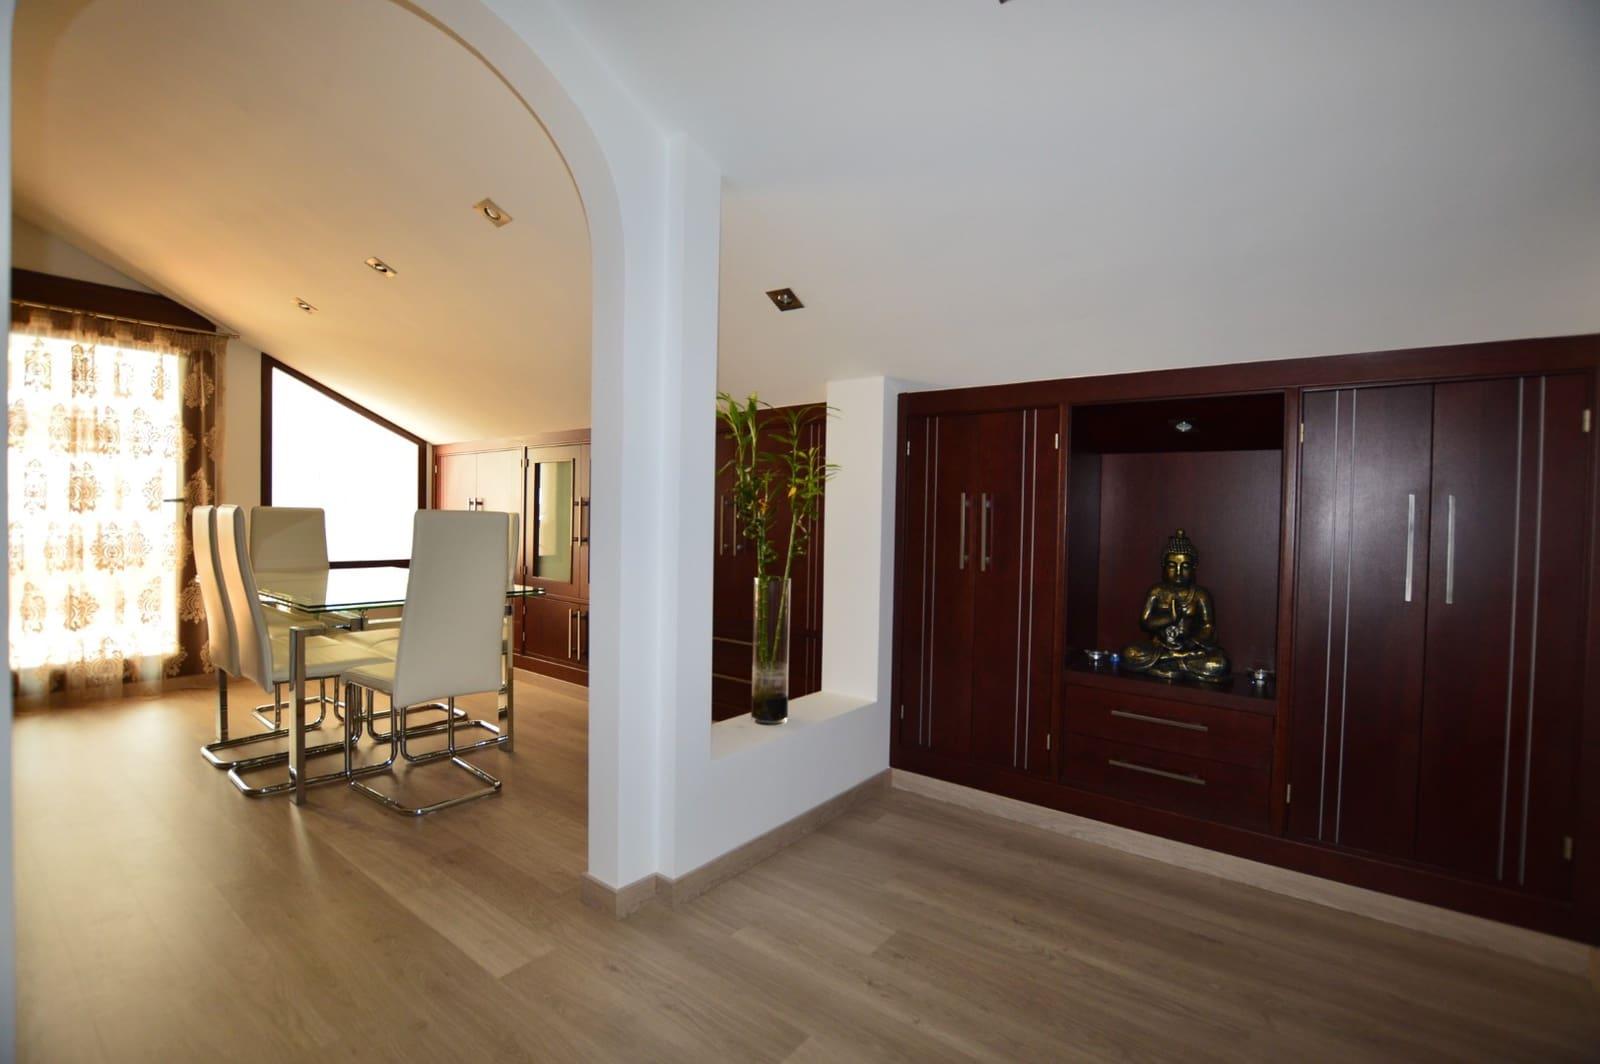 3 bedroom Apartment for rent in Alhaurin el Grande - € 950 (Ref: 5006368)